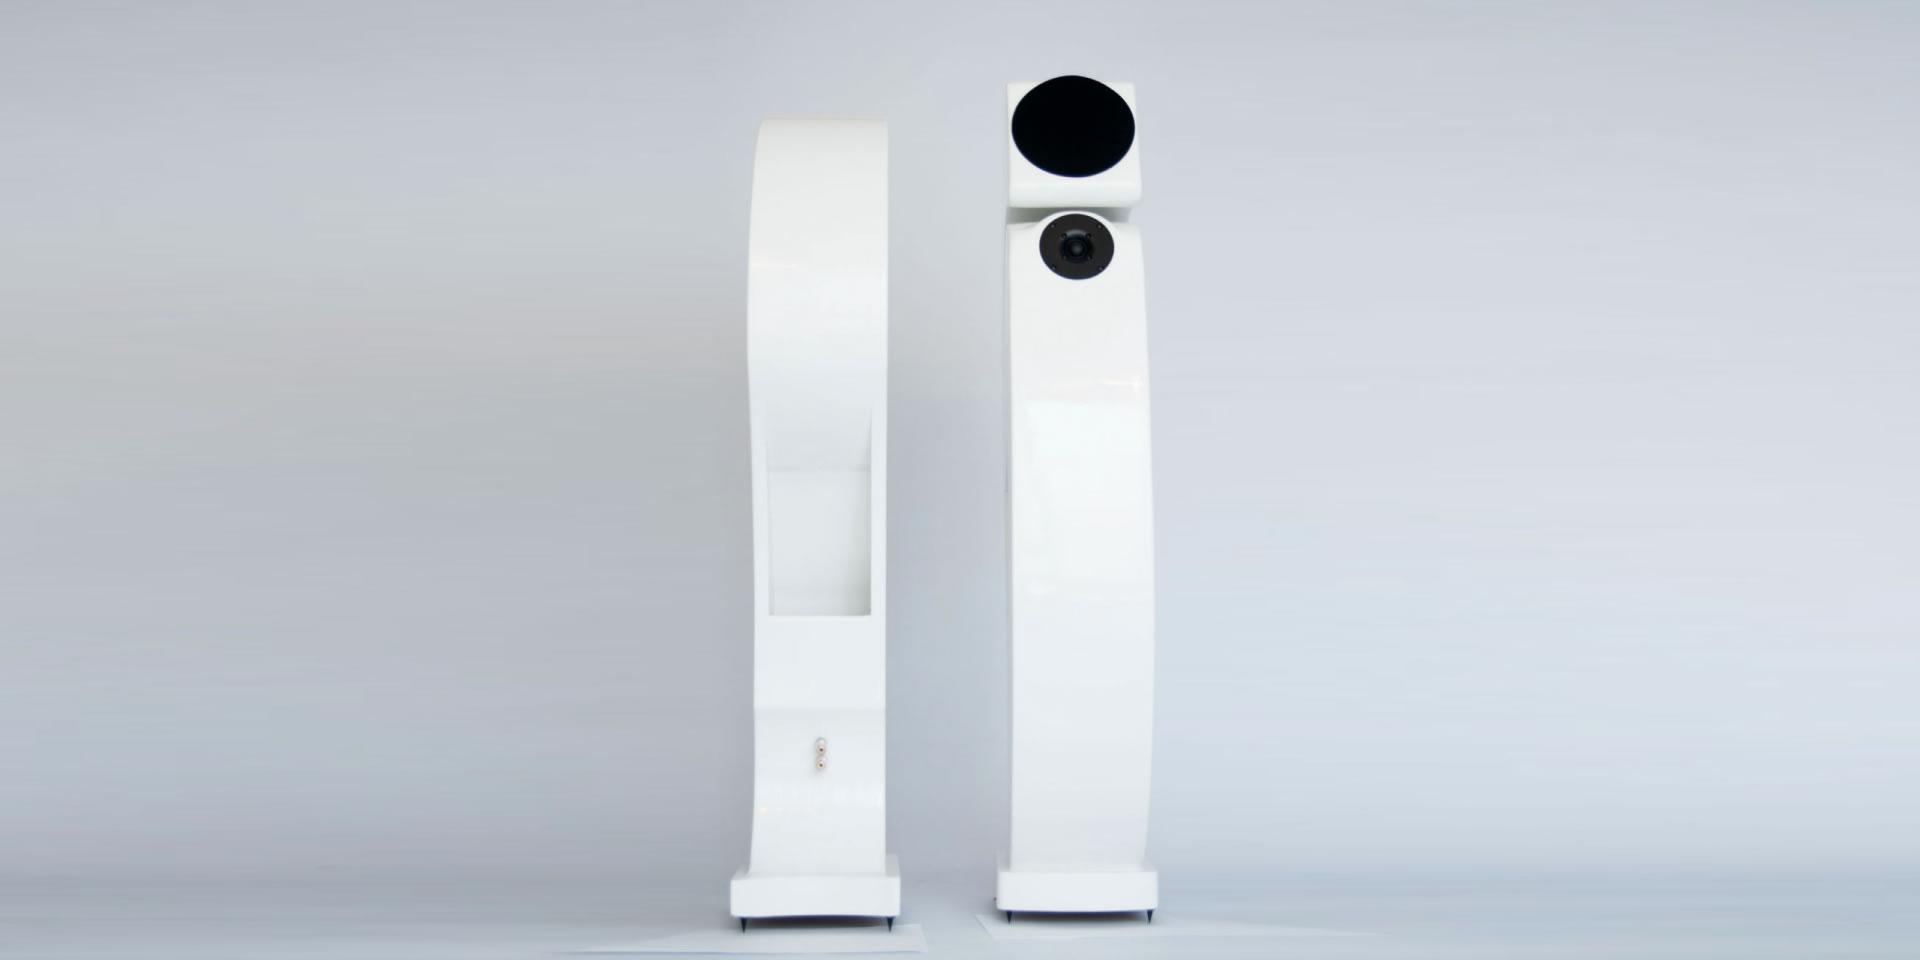 nederlandse design speakers - lifestylelady.nl